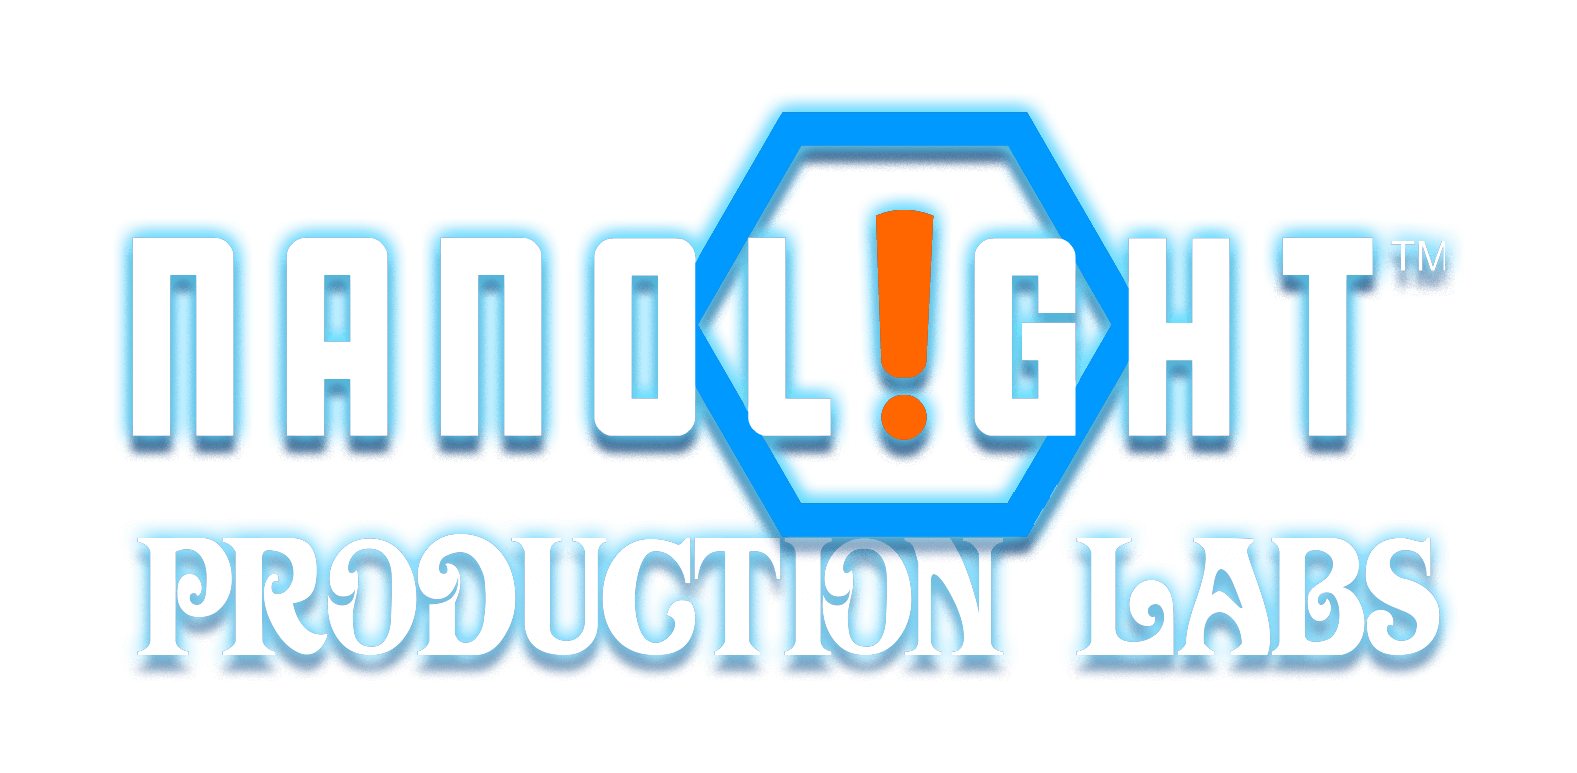 Nano Light Production Labs